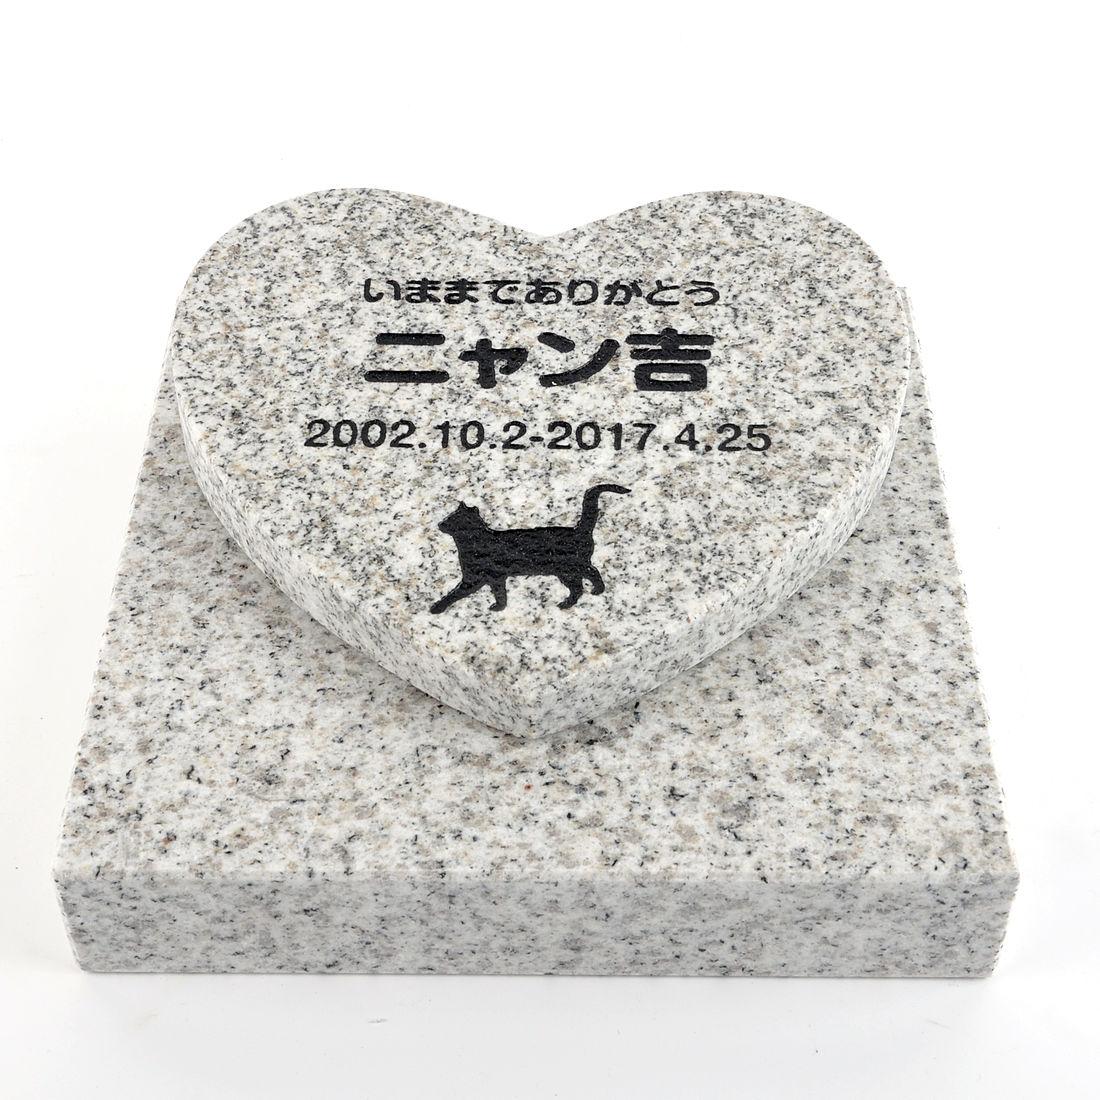 Pet&Love. ペットのお墓 天然石製 セット型 底板が厚く重いタイプ 御影石 グレー ハート  【HLS_DU】【楽ギフ_名入れ】 attr177attr ctgr2ctgr sml3sml+ctgr2ctgr CAT